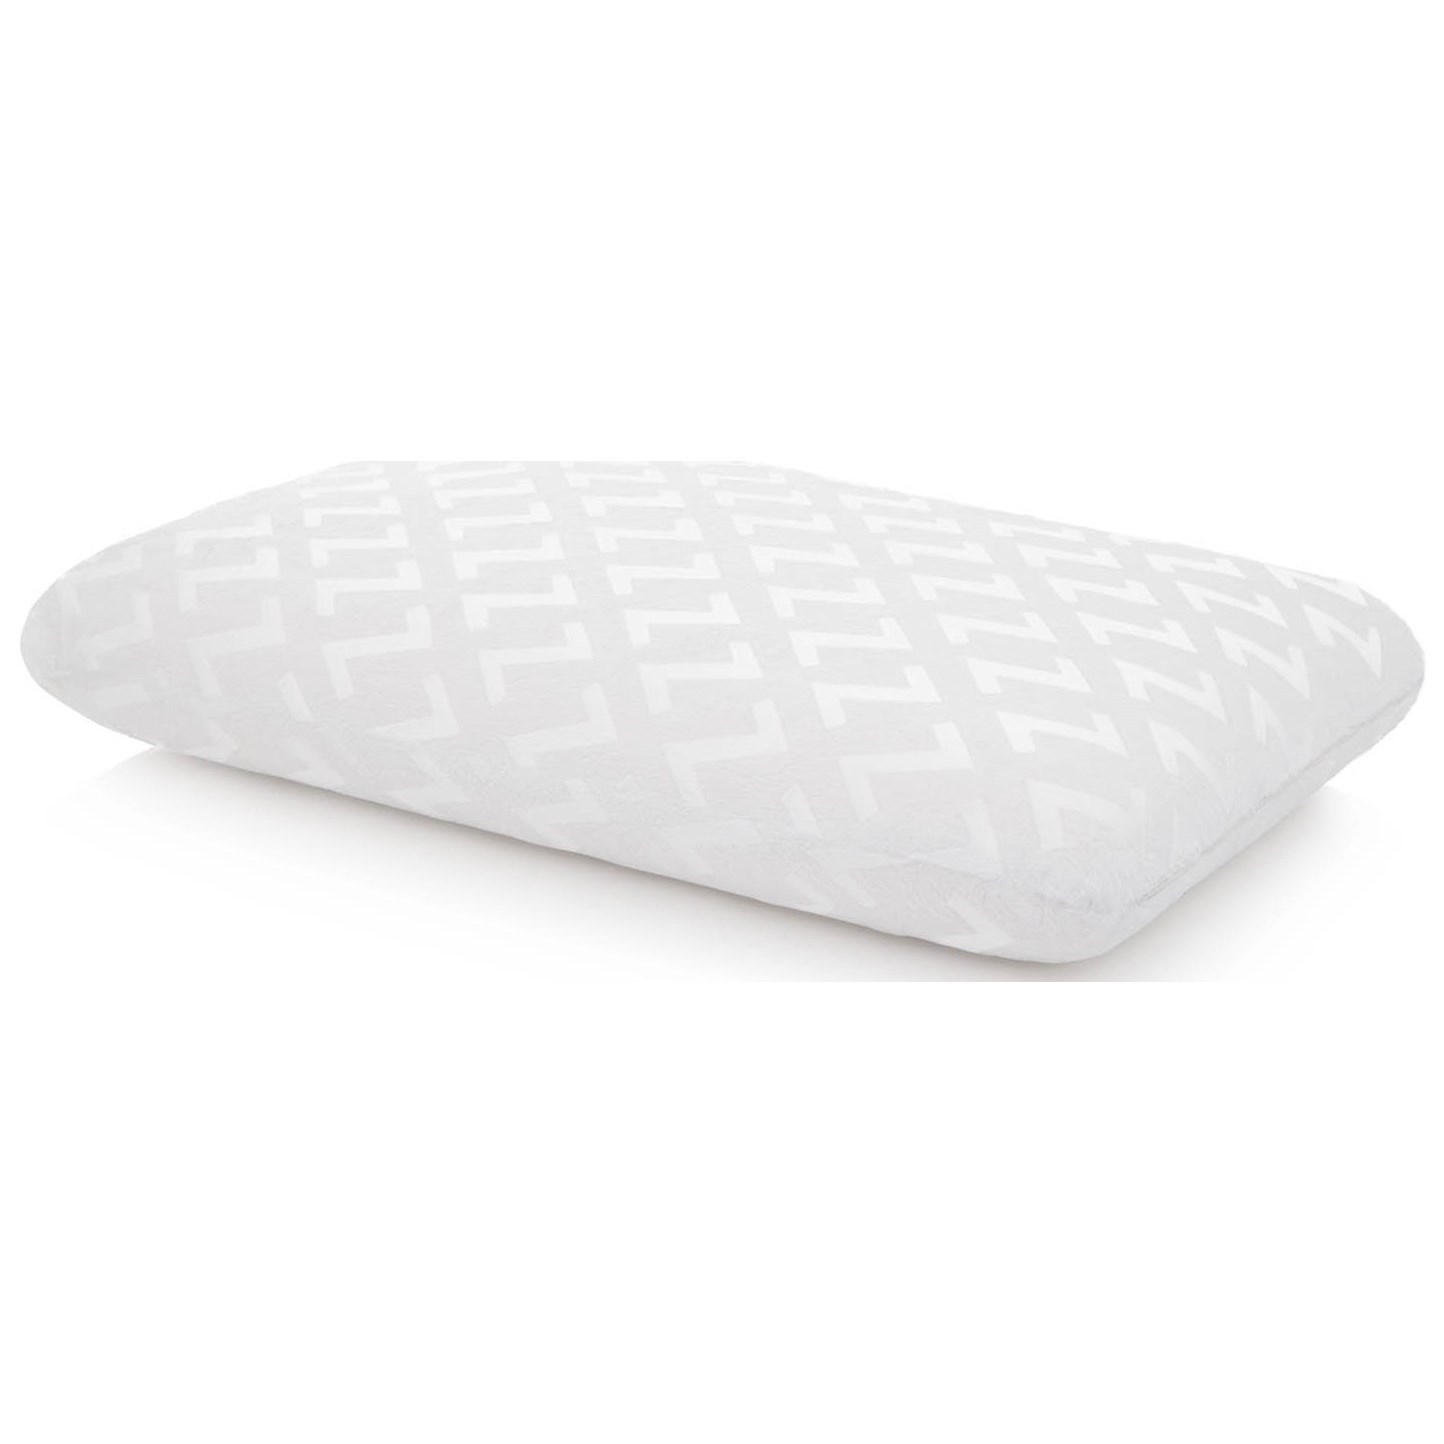 Malouf Latex Standard Latex Pillow - Item Number: ZZSSMPDULX